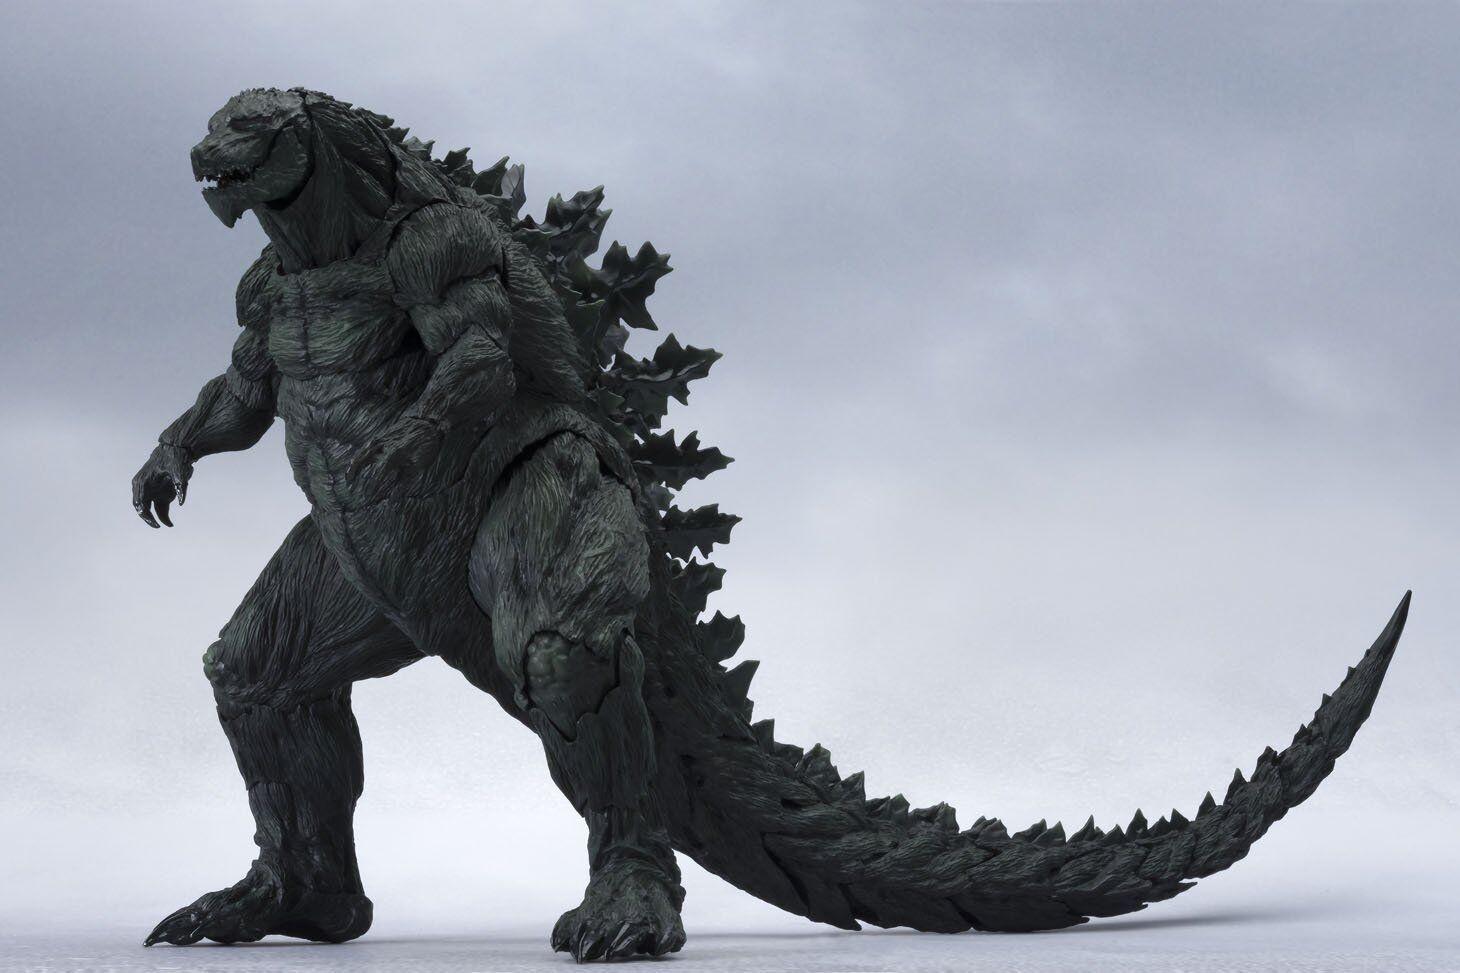 S. H. Montruo Artes Godzilla Montruo Planeta Godzilla (2017) Figura 170mm